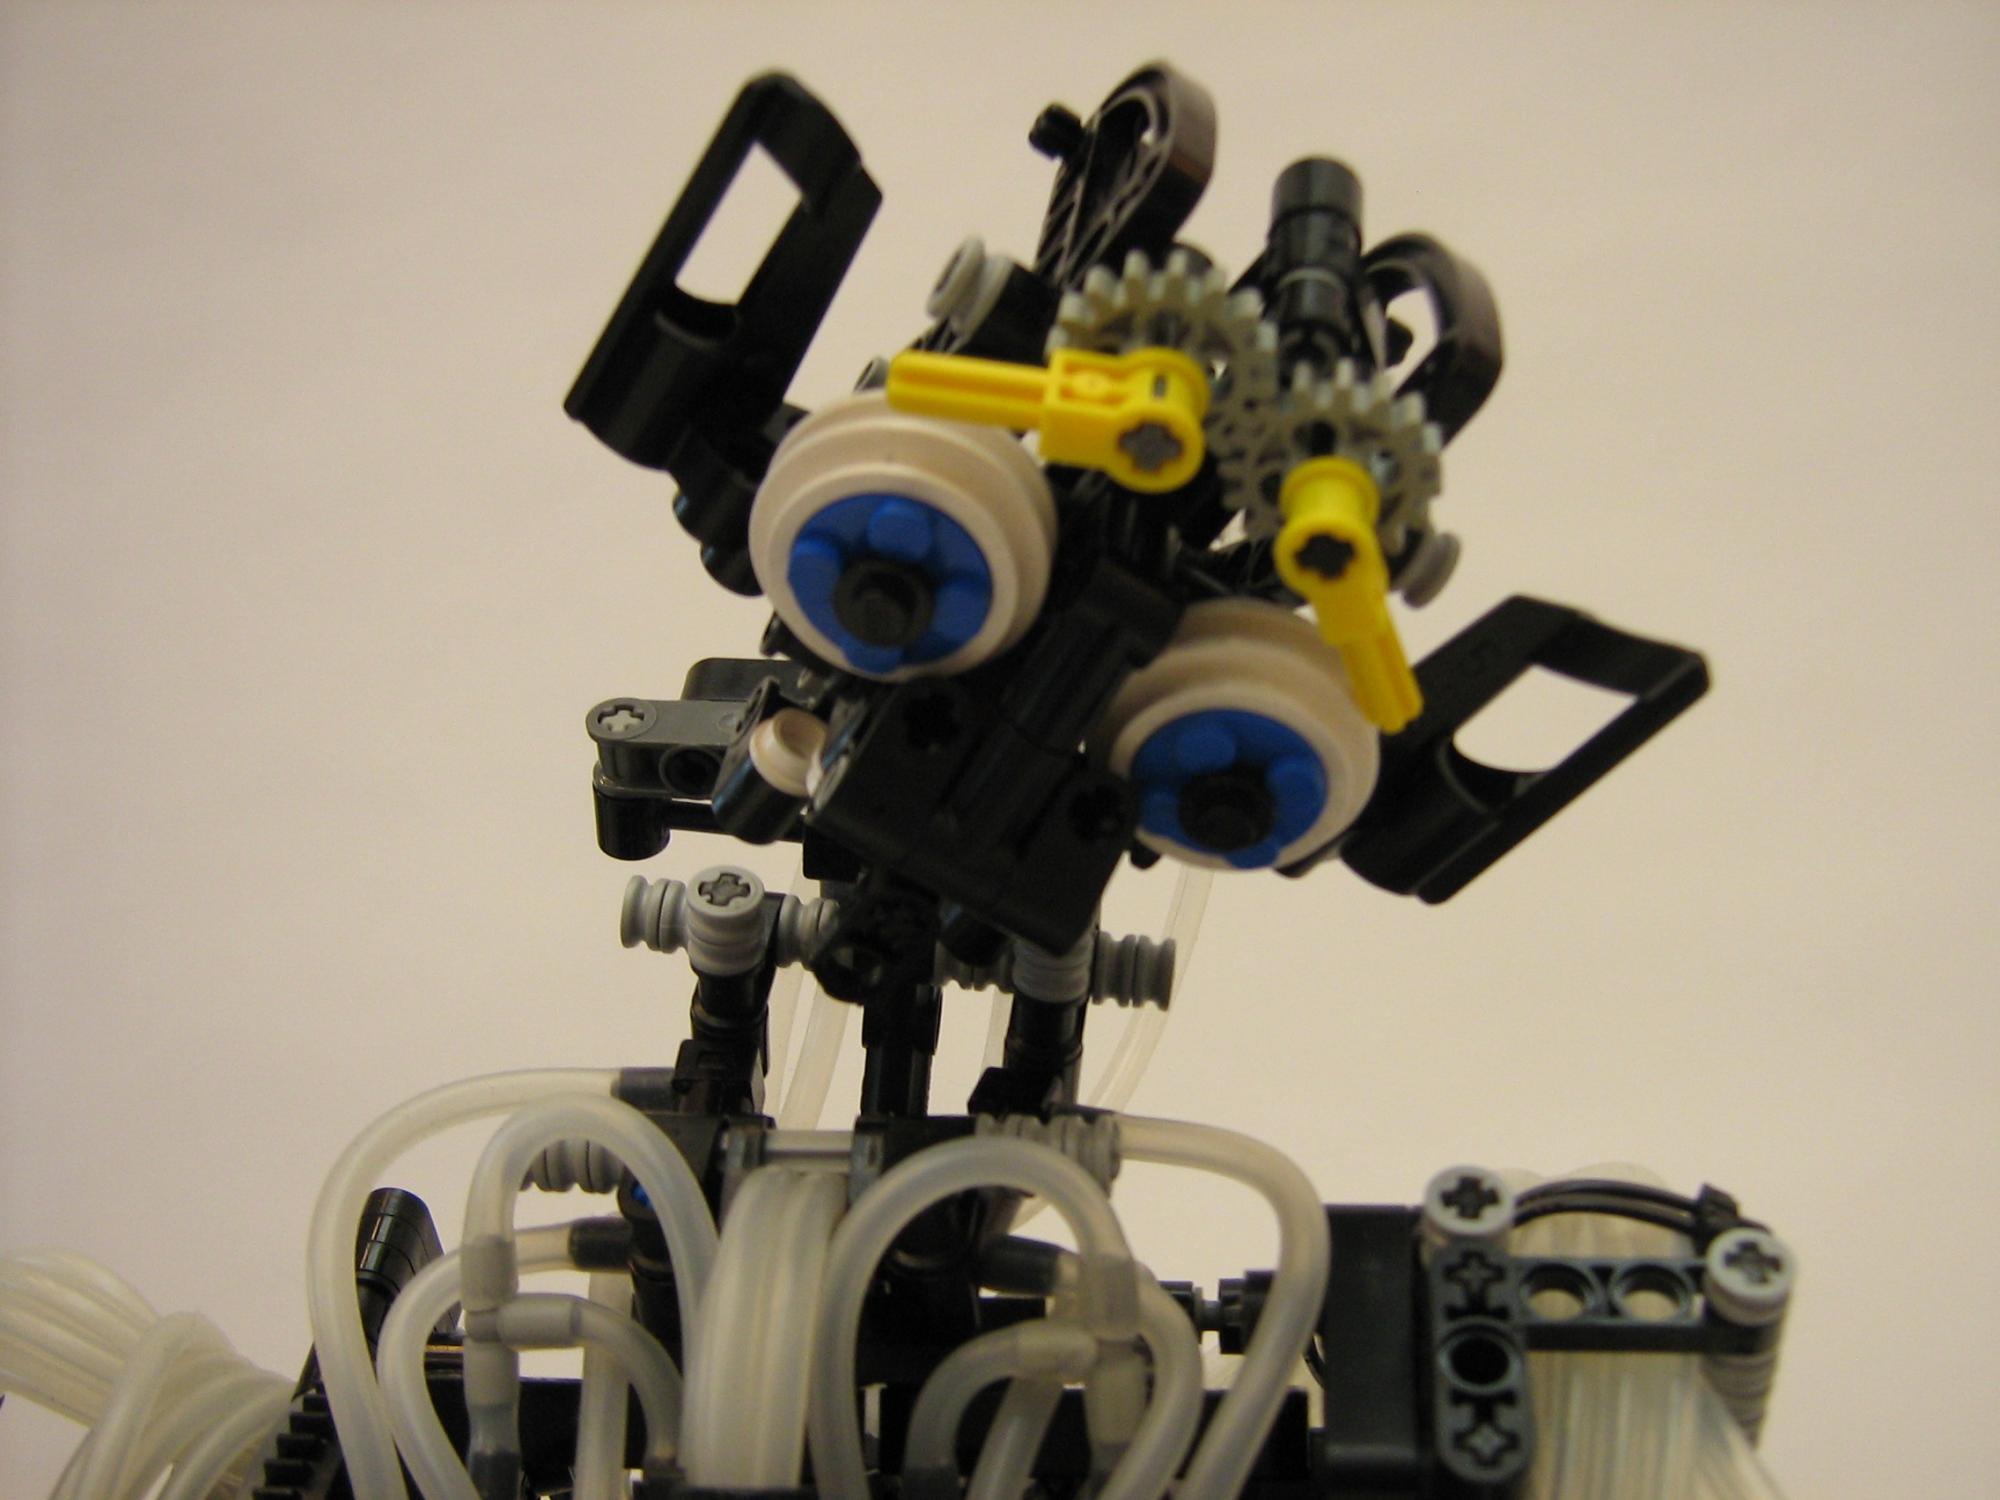 Tækni lego